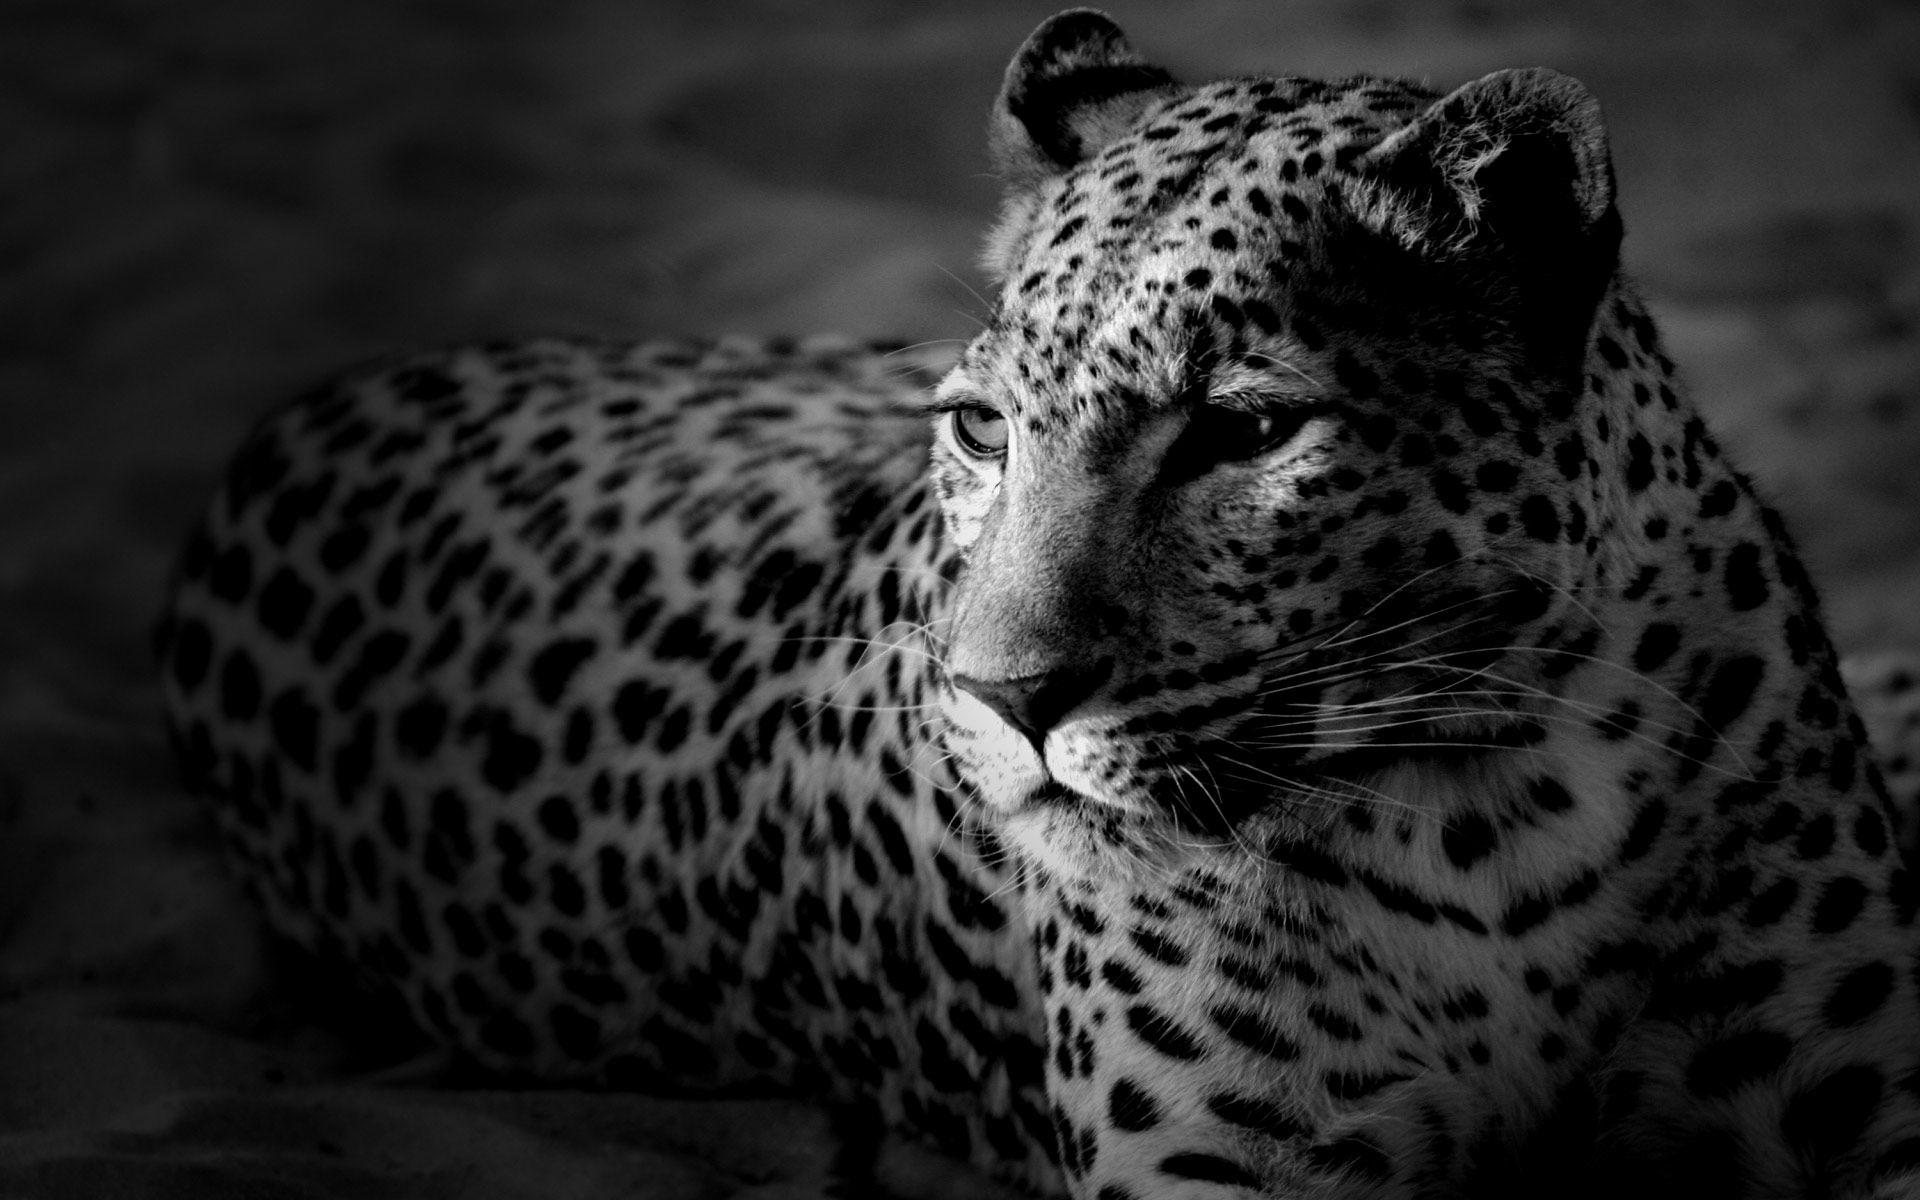 Tiger Black And White HD Wallpaper